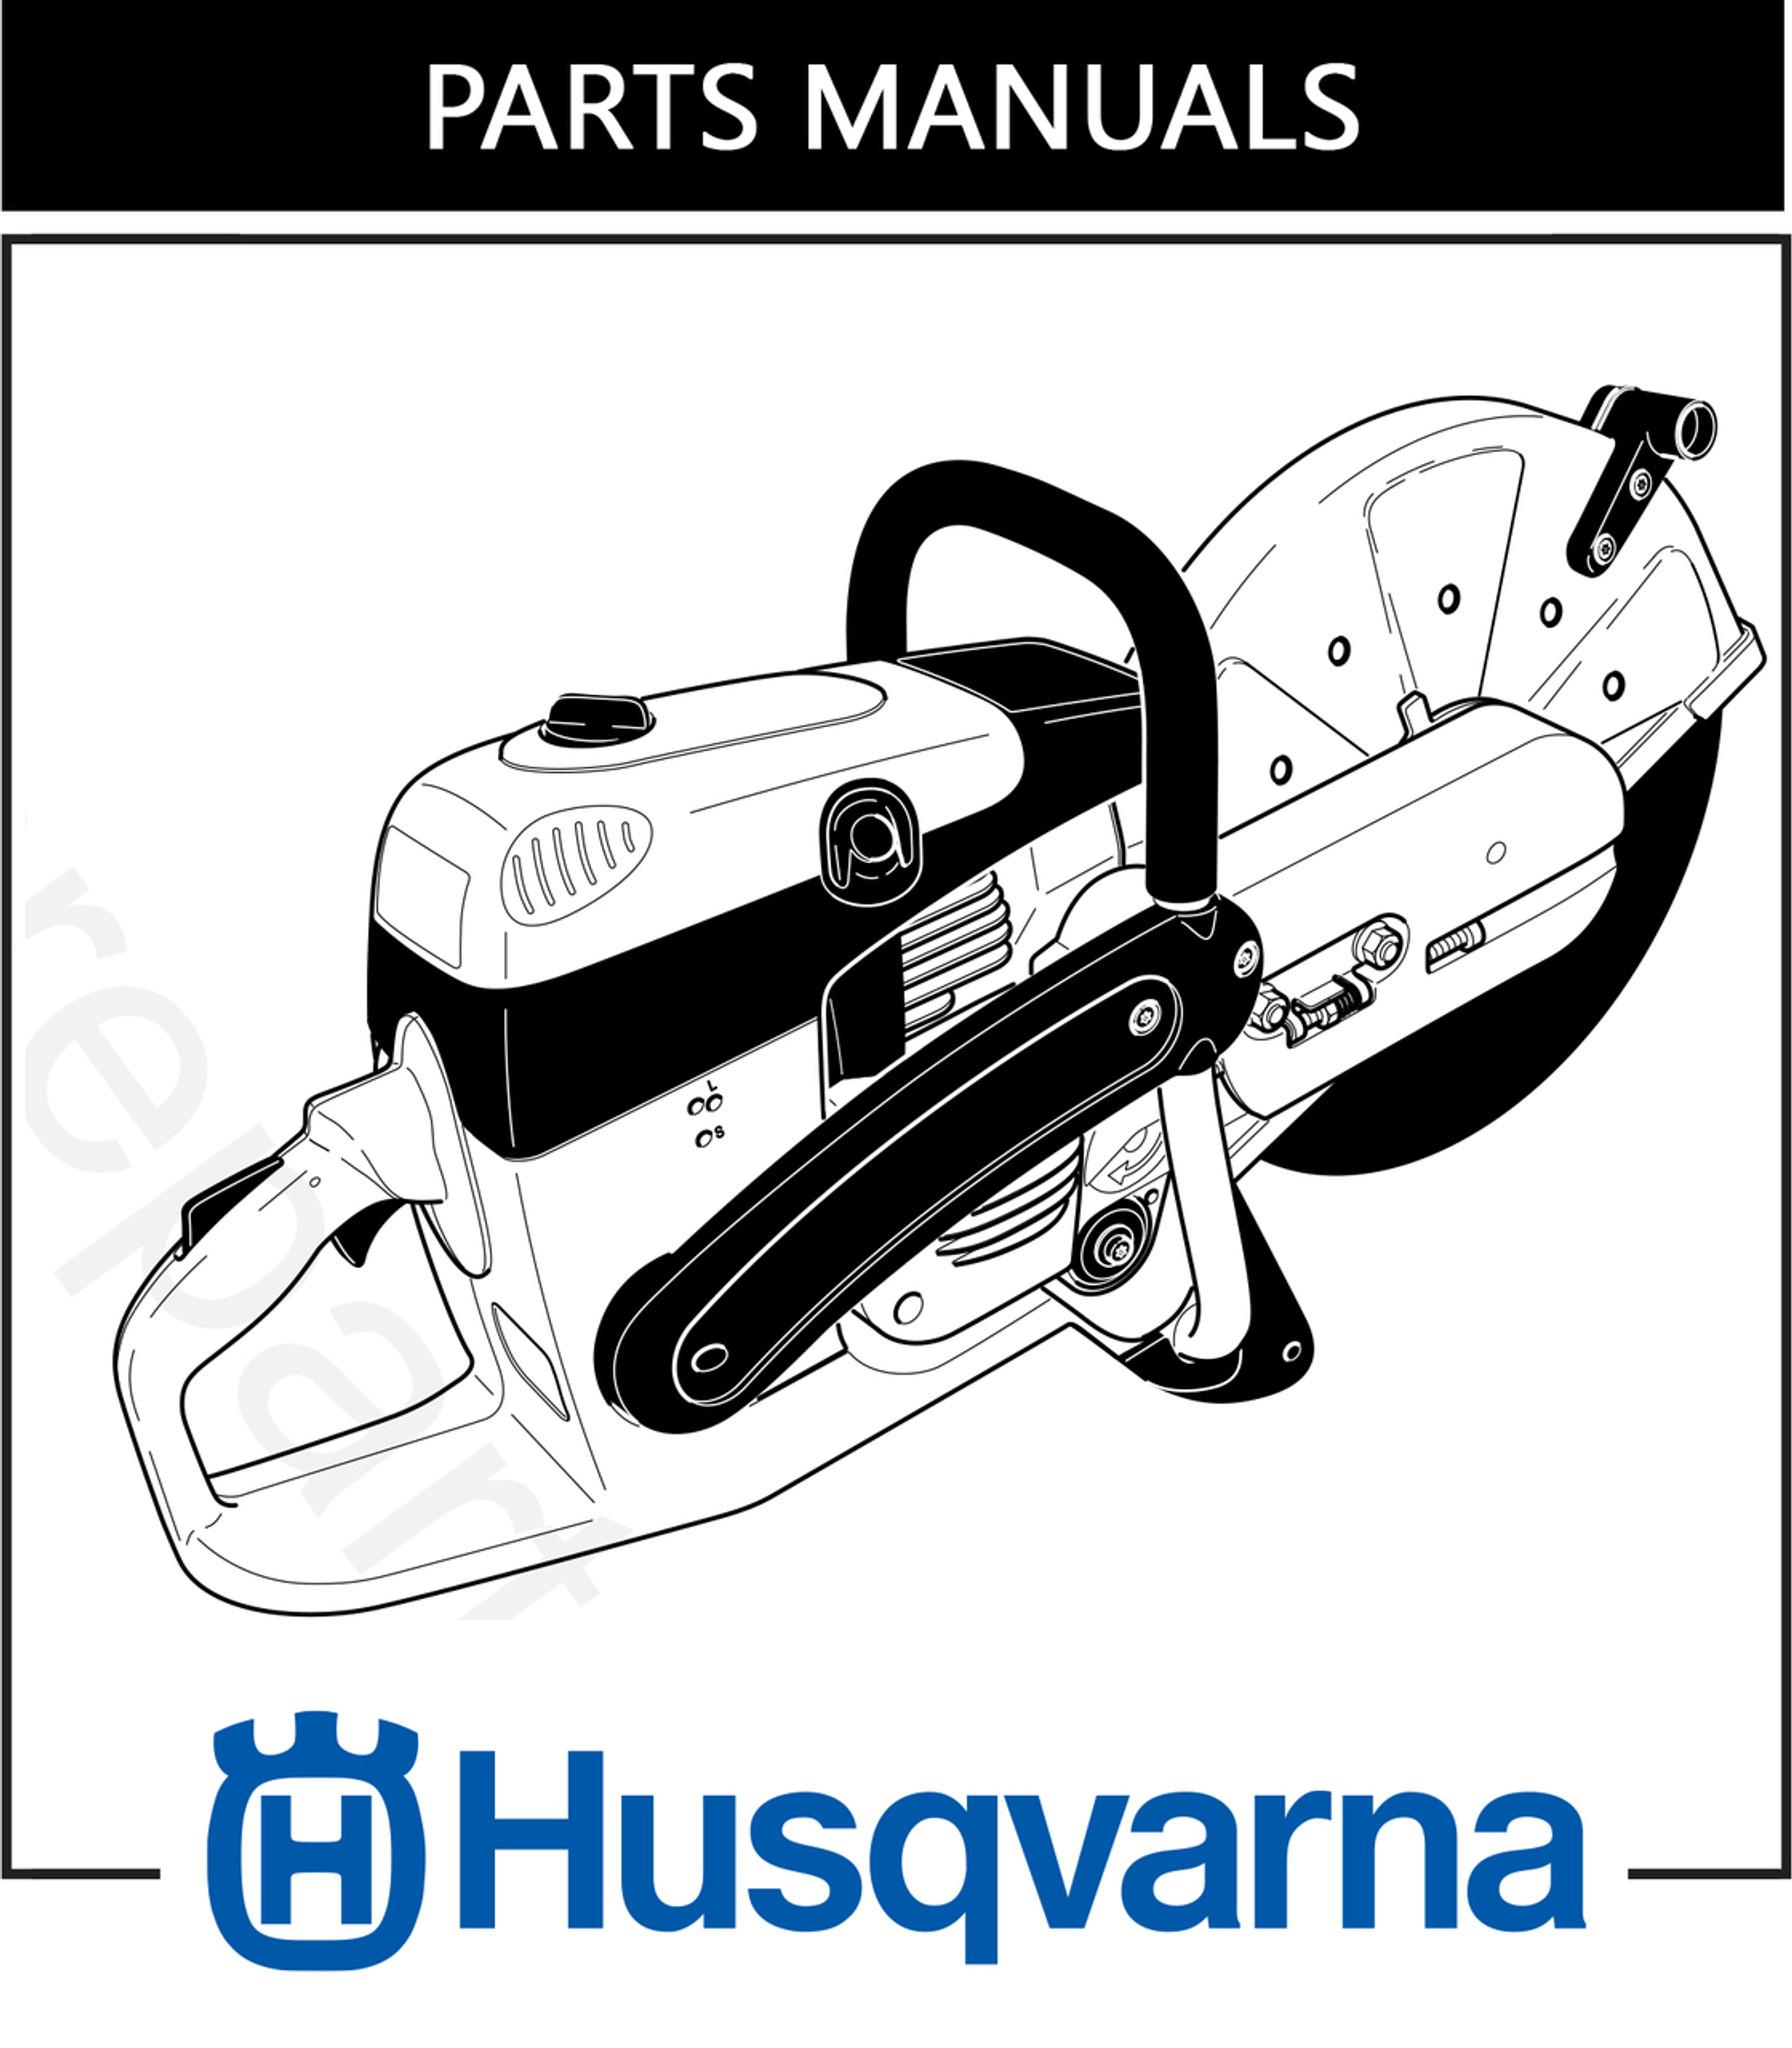 parts manual husqvarna k760 free download dhs equipment rh stores dhsequipmentparts com husqvarna k760 service manual husqvarna k760 service manual